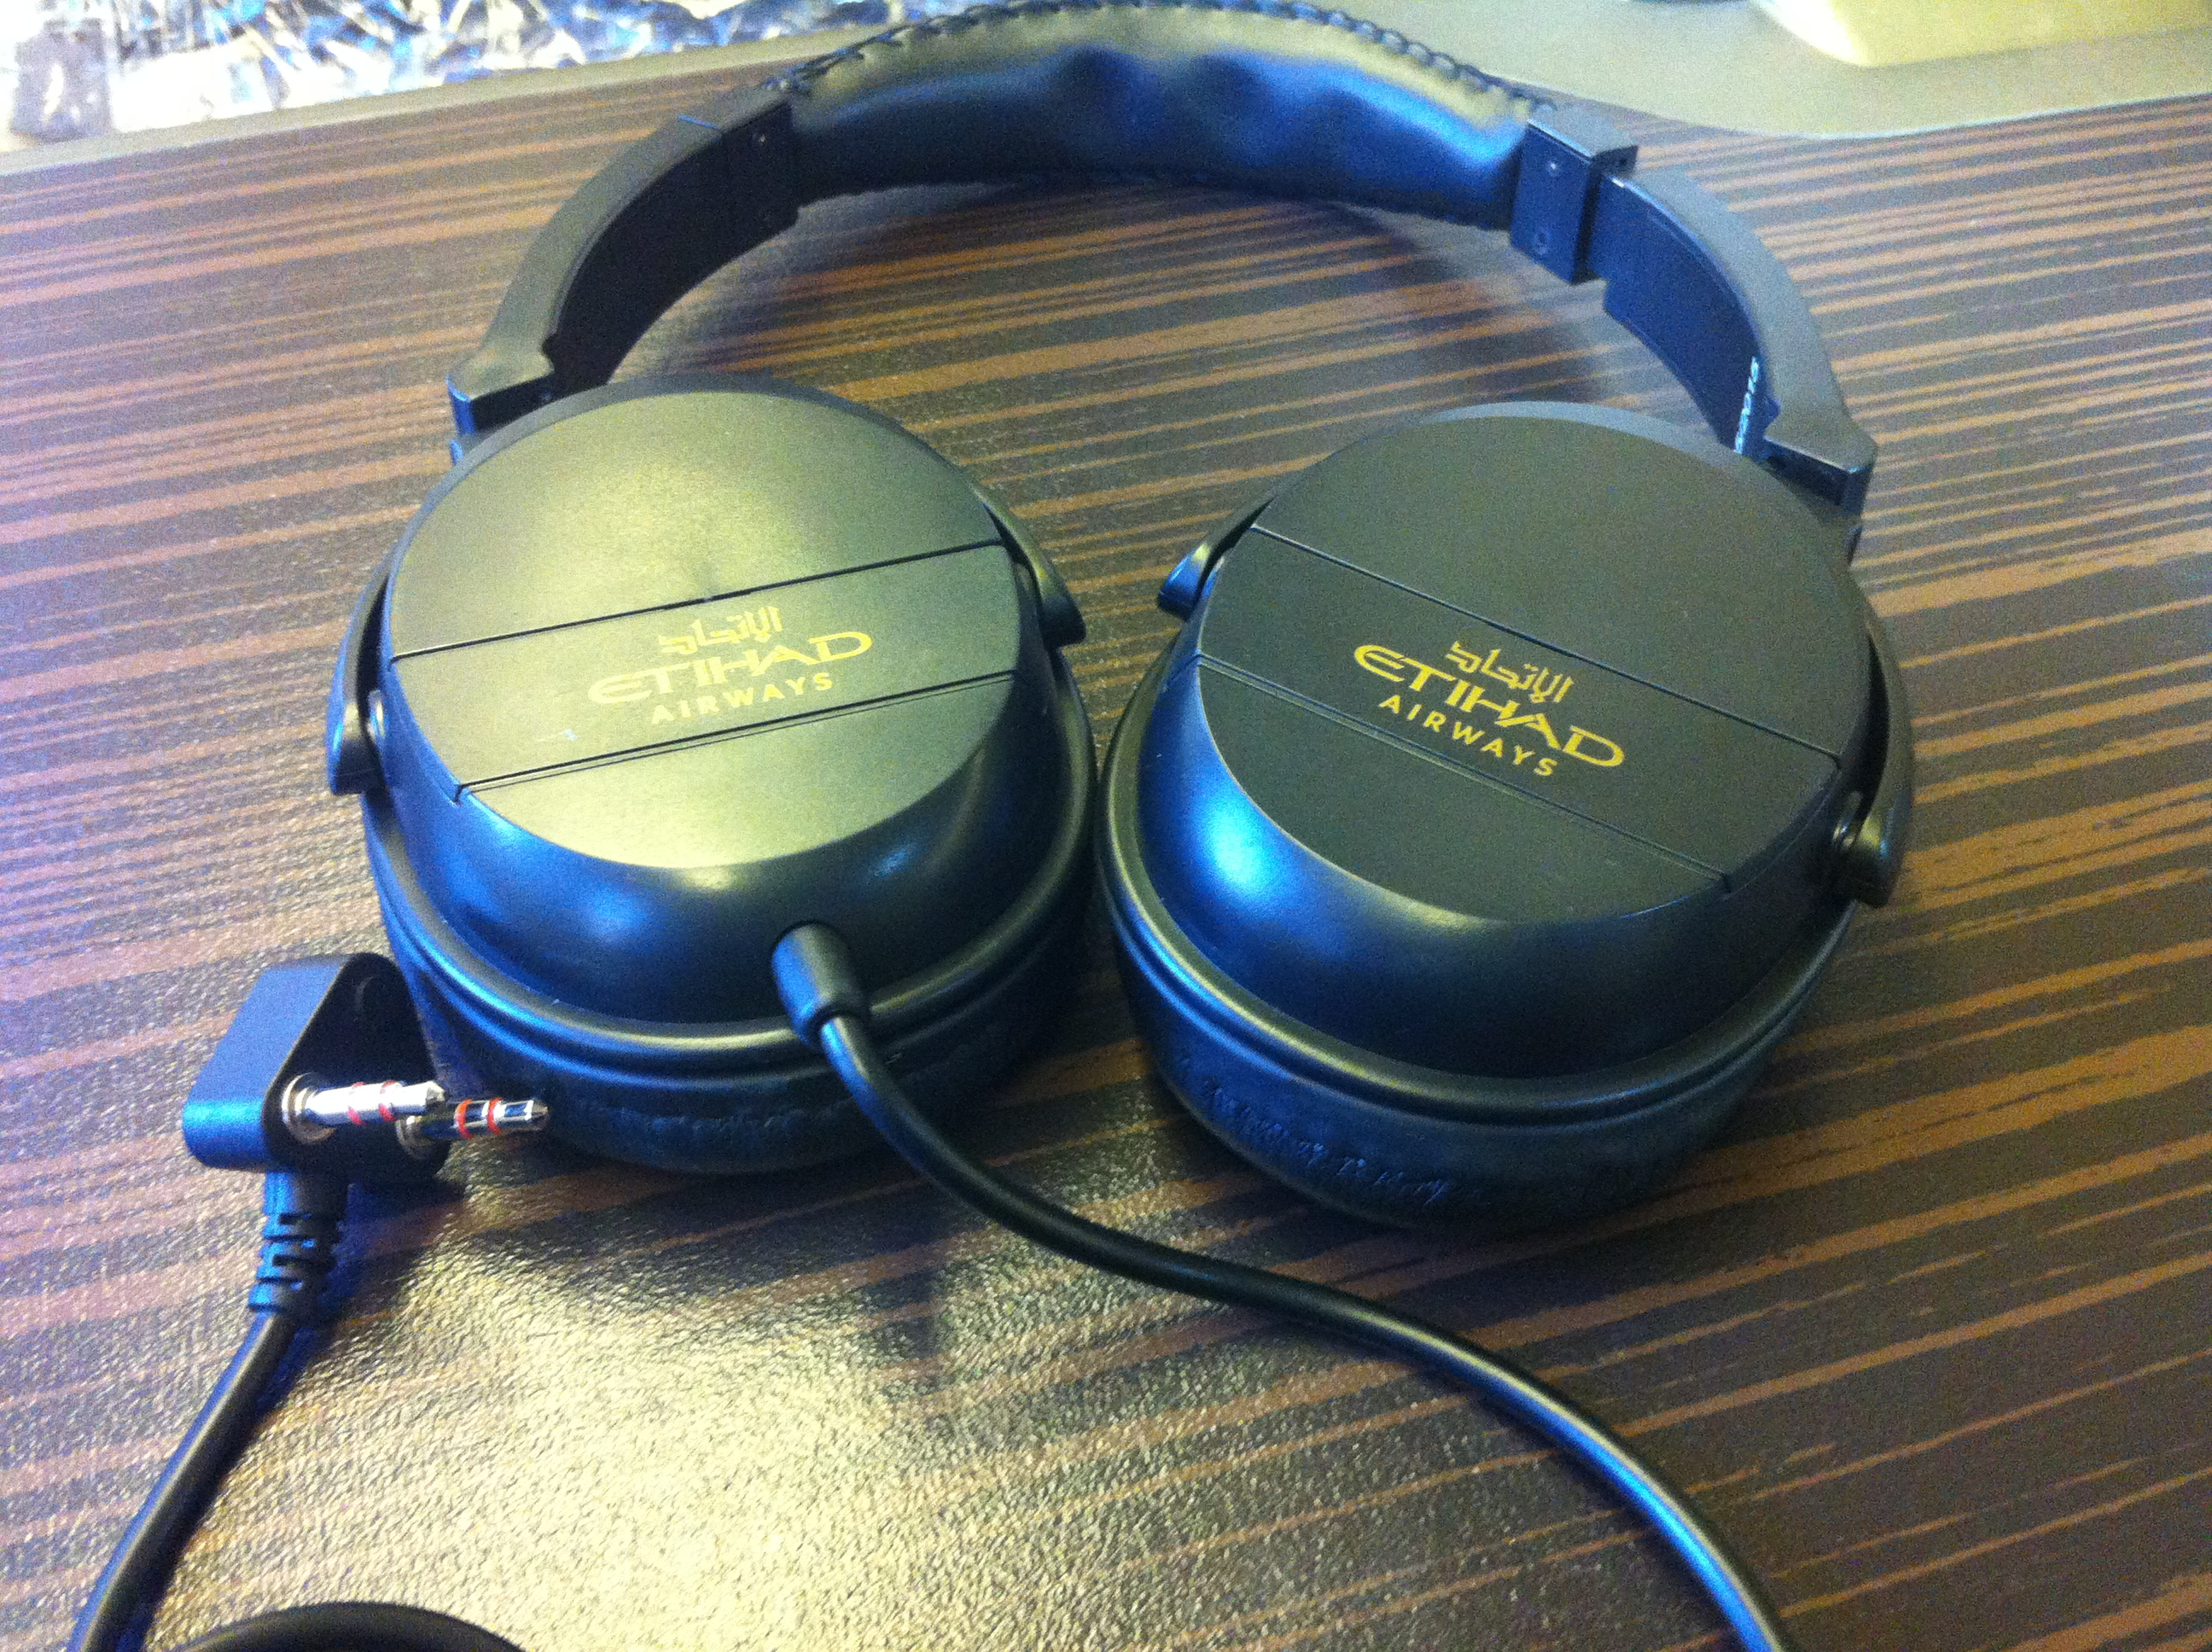 Etihad Business Class head phones